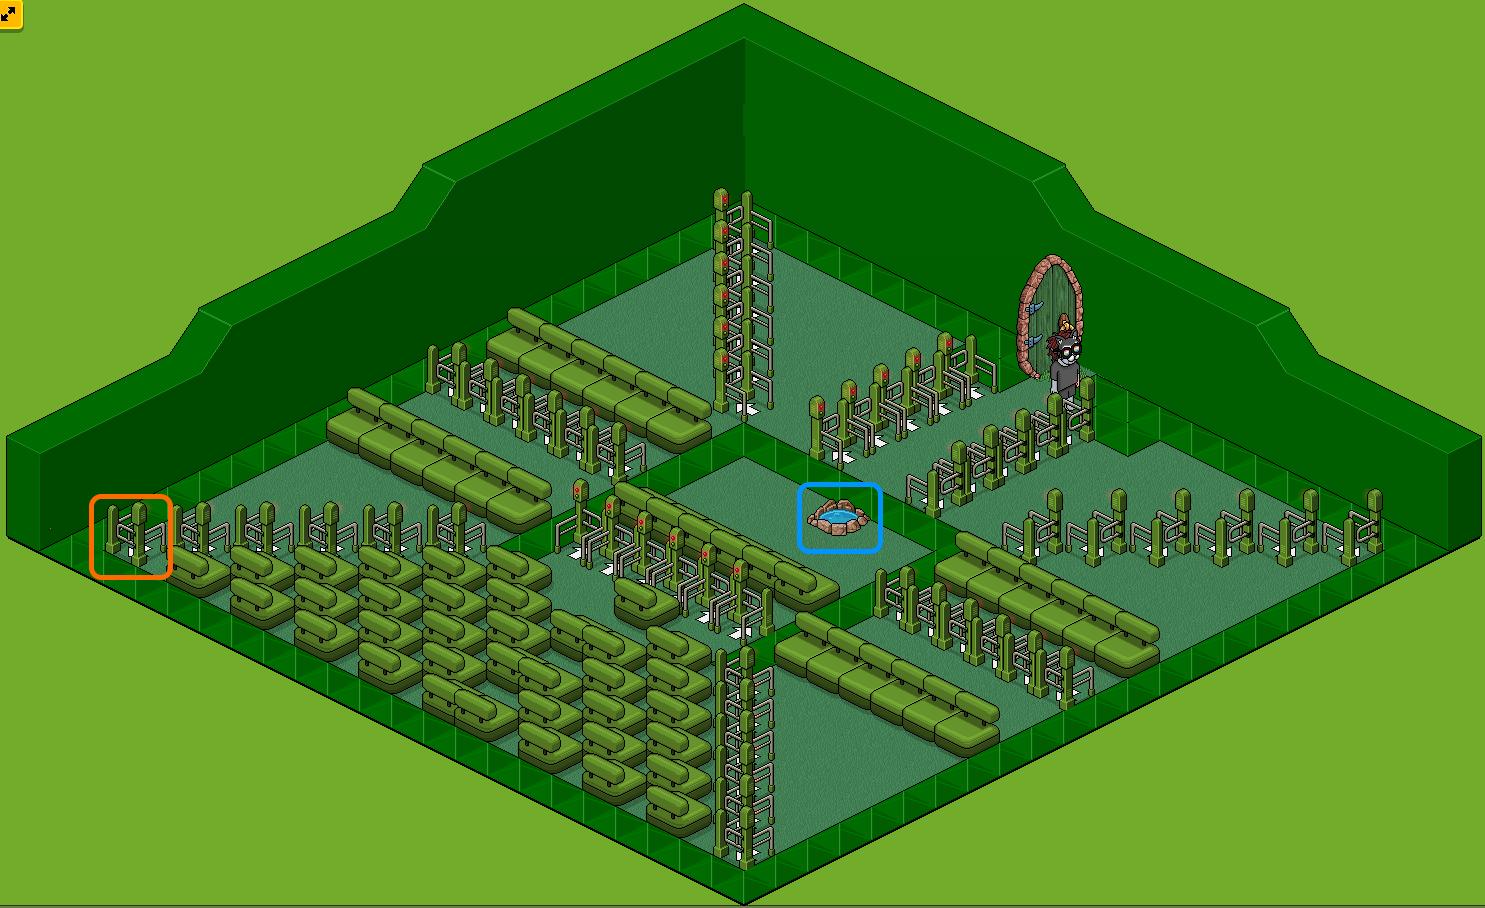 [Pride] Labyrinthe - Vert